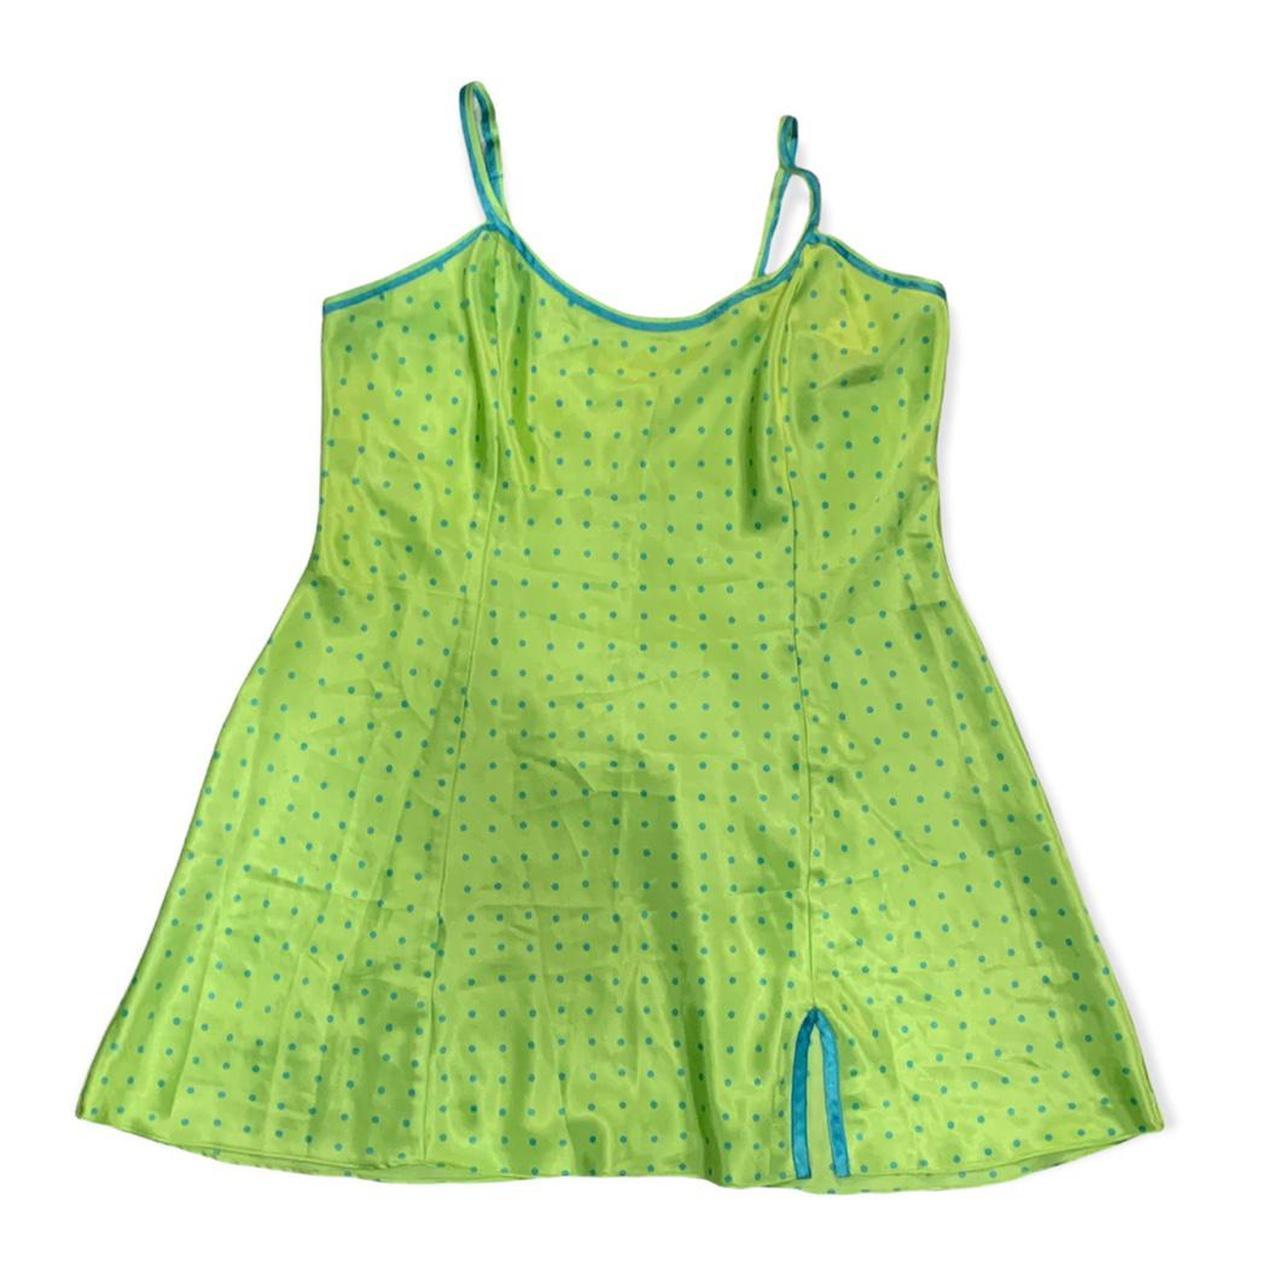 Product Image 1 - Vintage slip dress lingerie nightgown